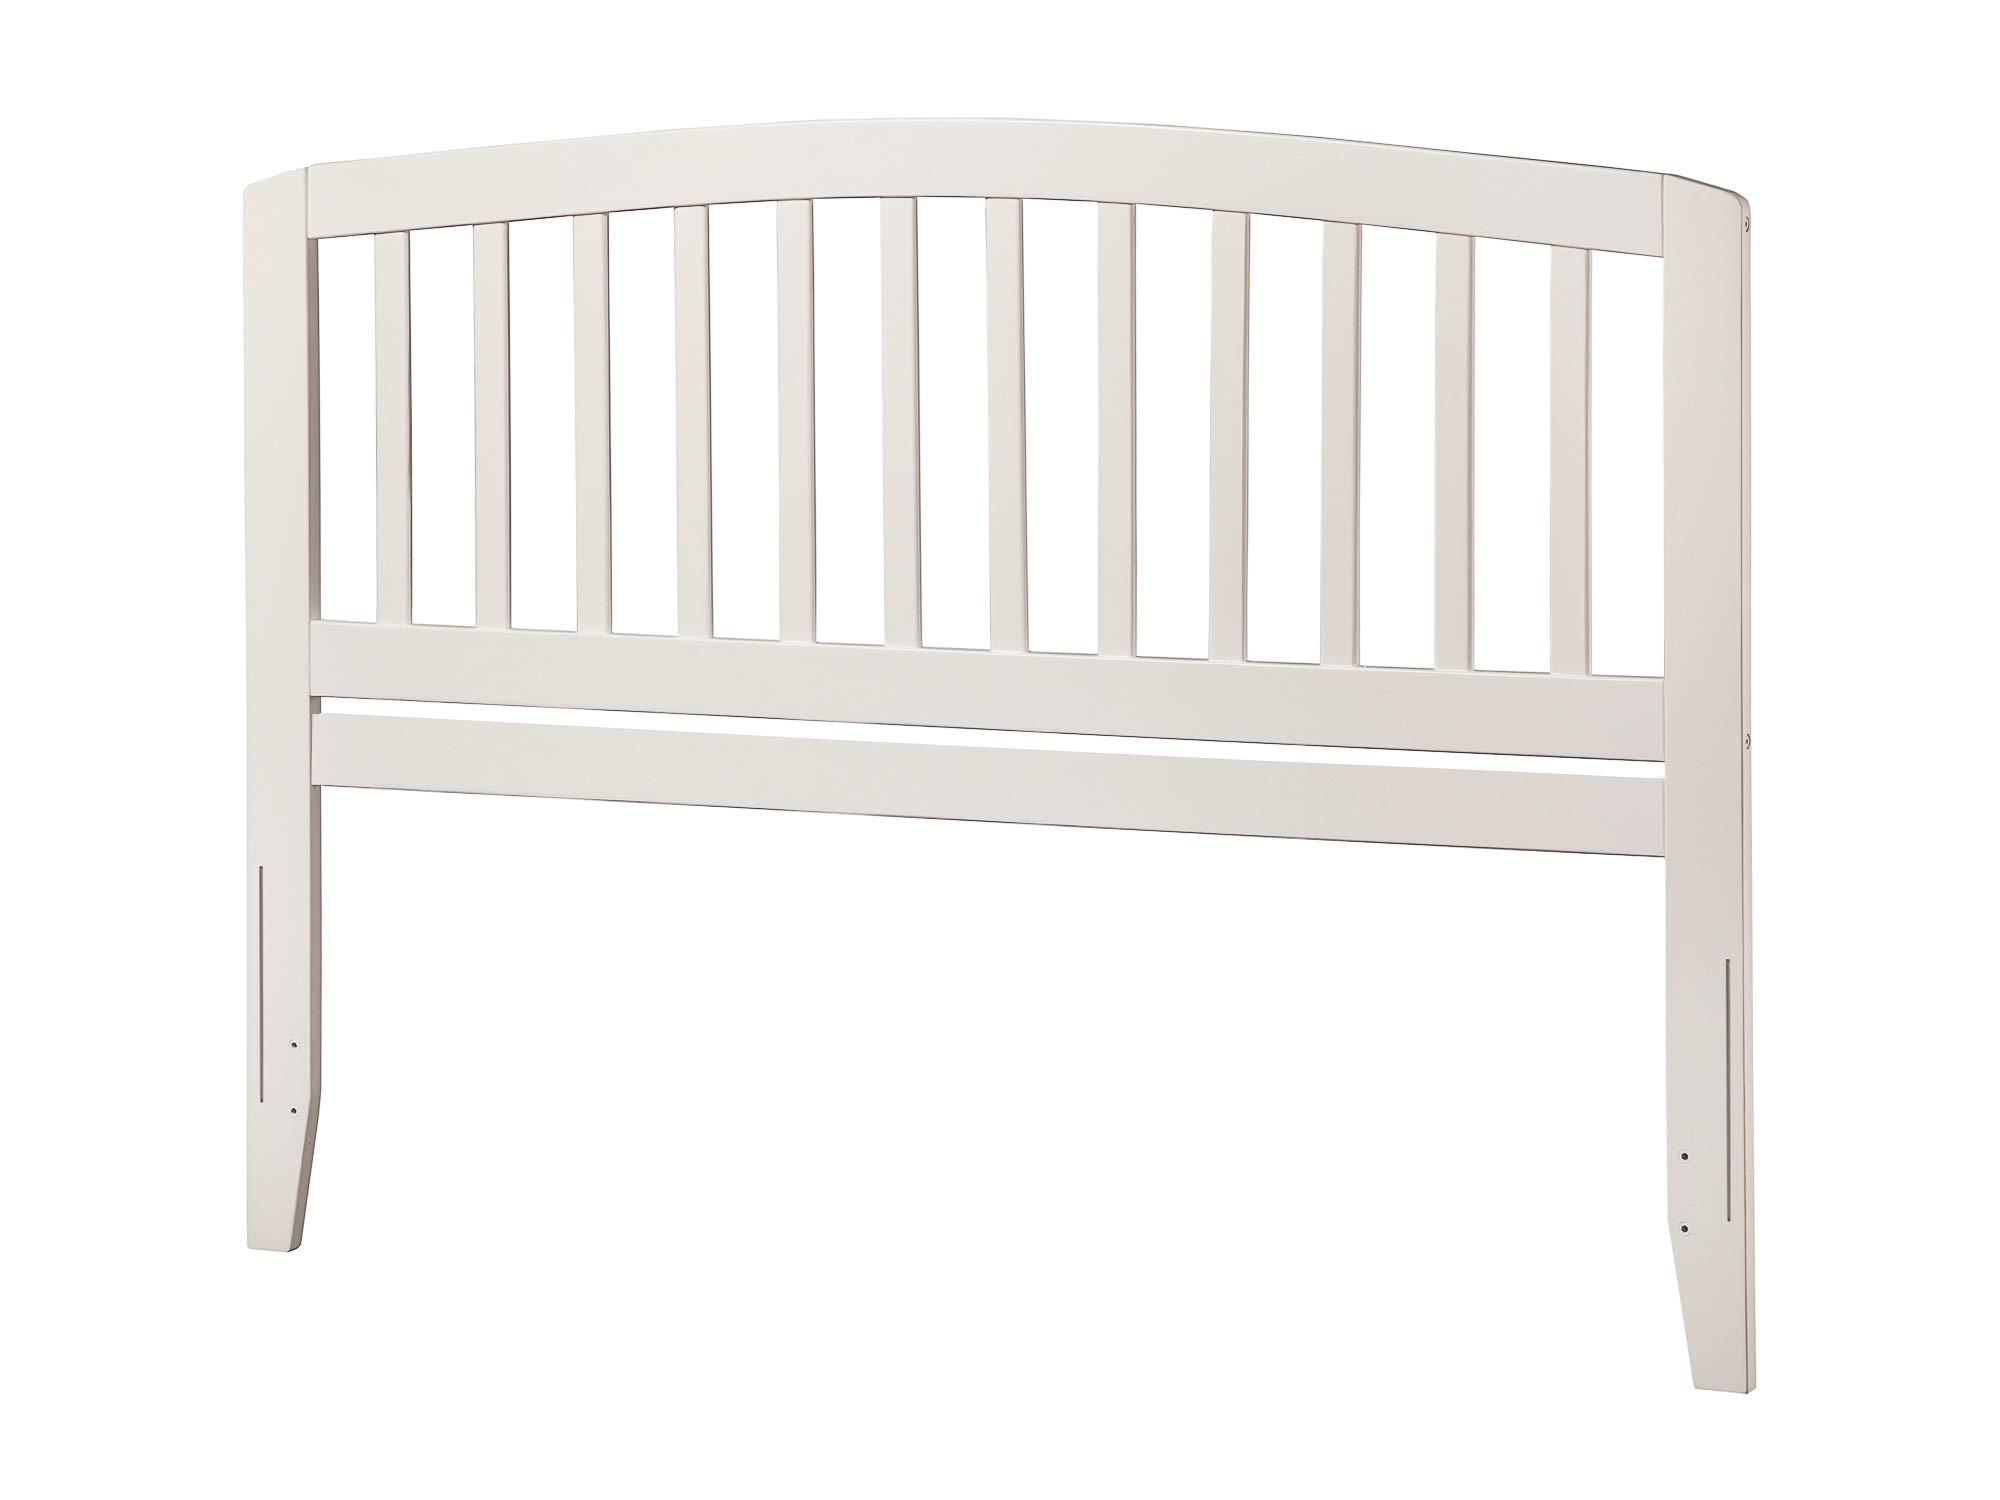 Atlantic Furniture AR288842 Richmond Headboard, Queen, White by Atlantic Furniture